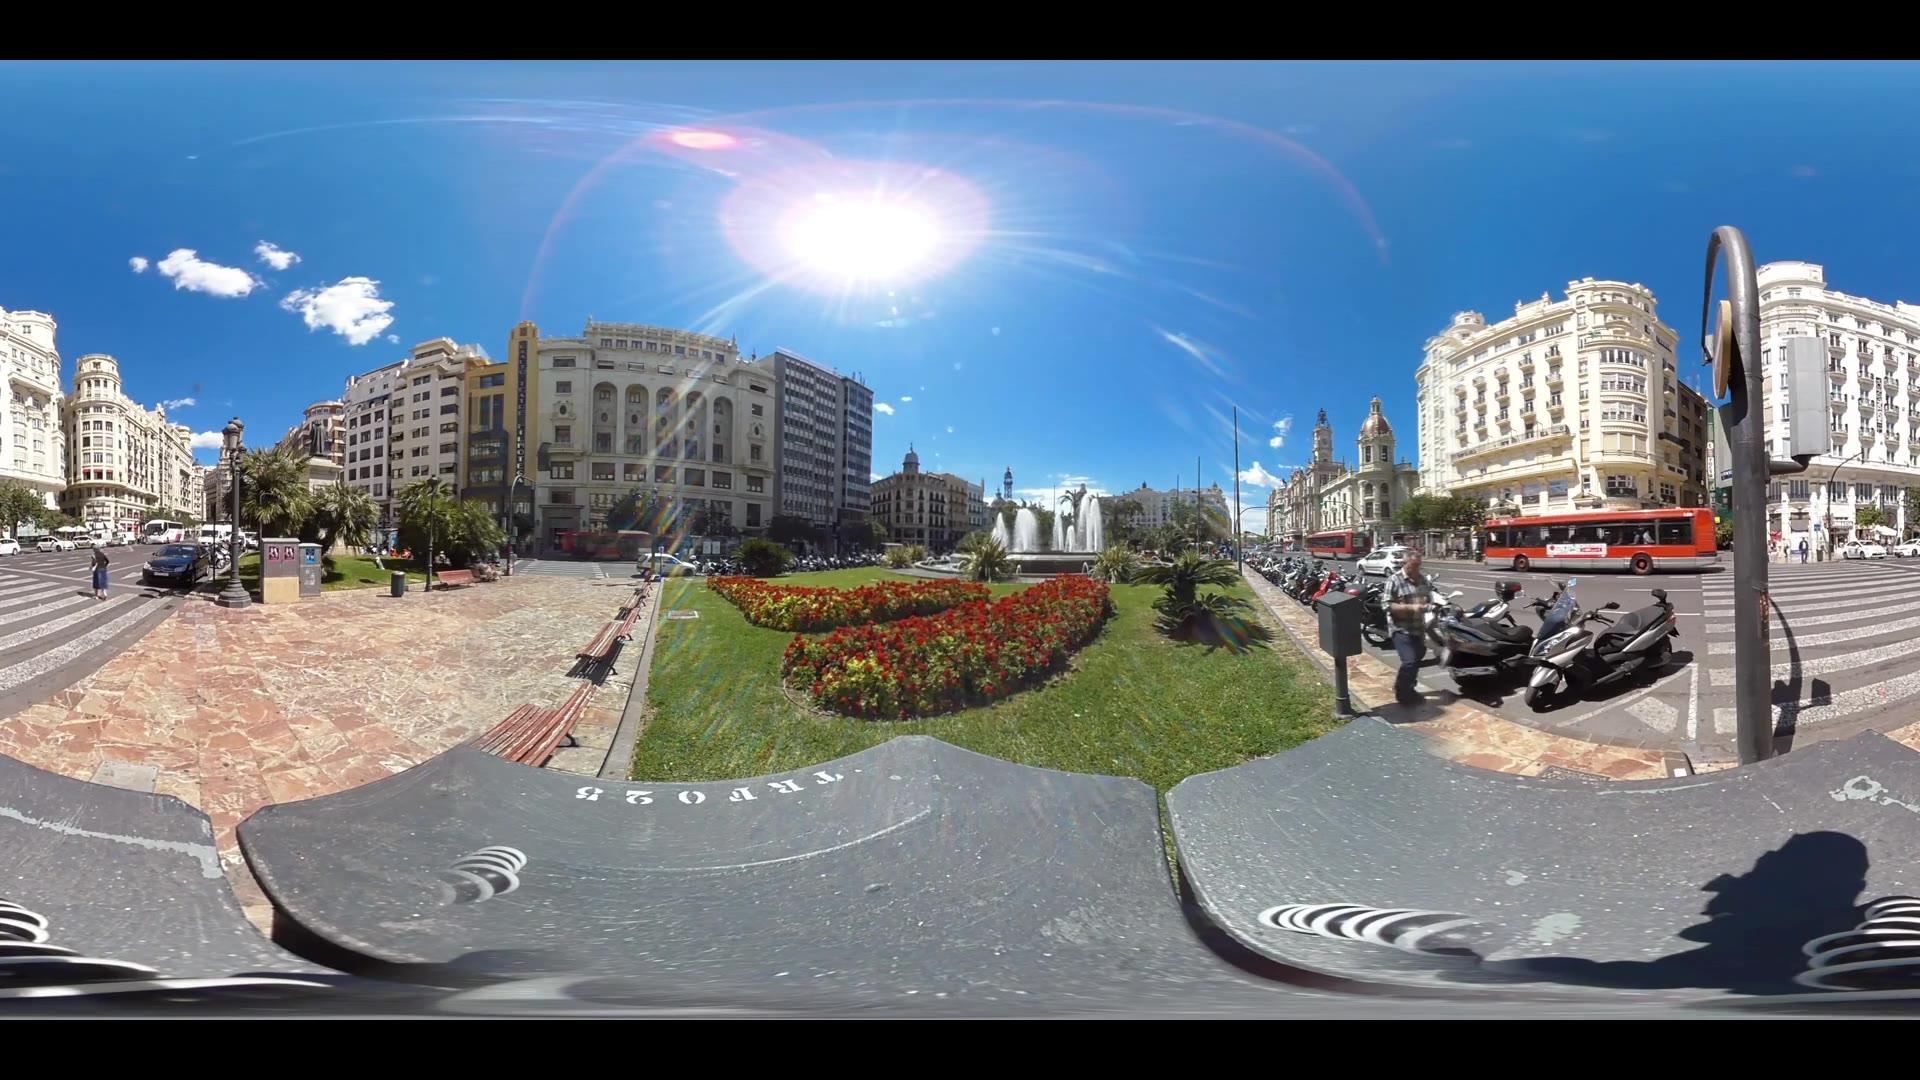 Virtual Reality 360 view from Plaça de l'Ajuntament in Valencia in Spain